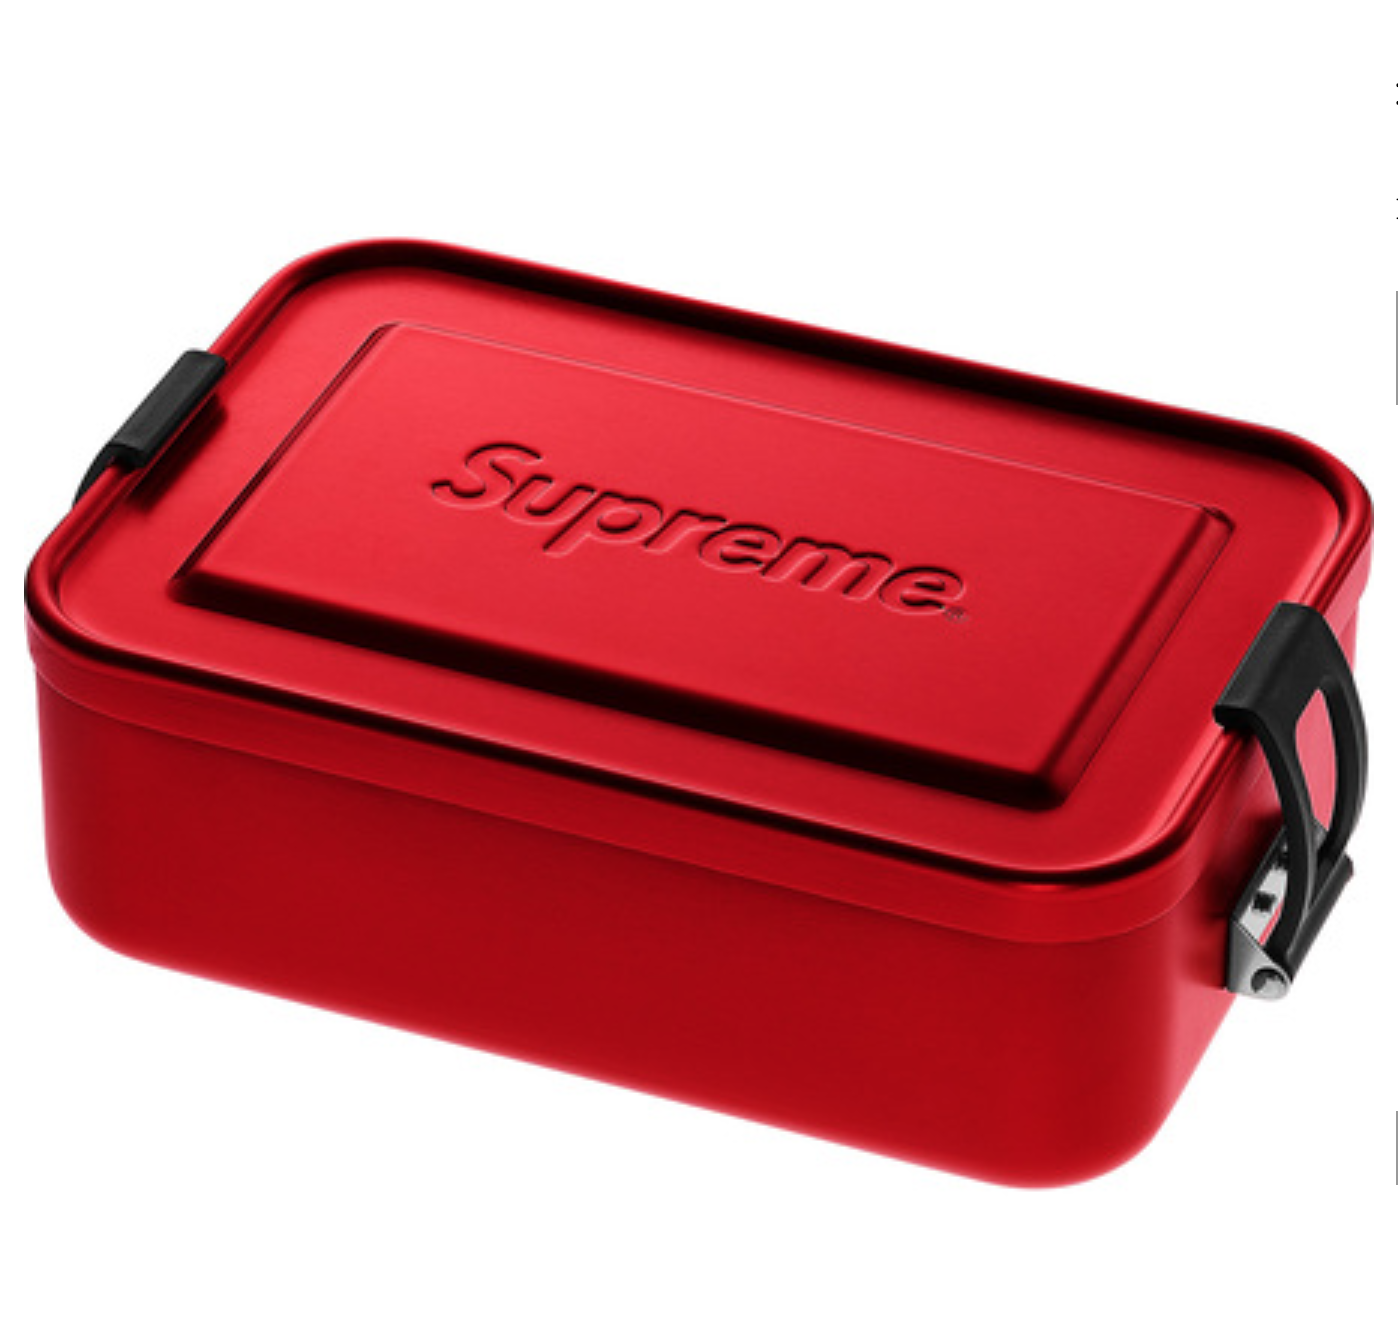 Supreme 18SS SIGG Small Metal Box Portable Lunch Box Storage Box Tool Box Red  sc 1 st  eBay & Supreme 18SS SIGG Small Metal Box Portable Lunch Box Storage Box ...